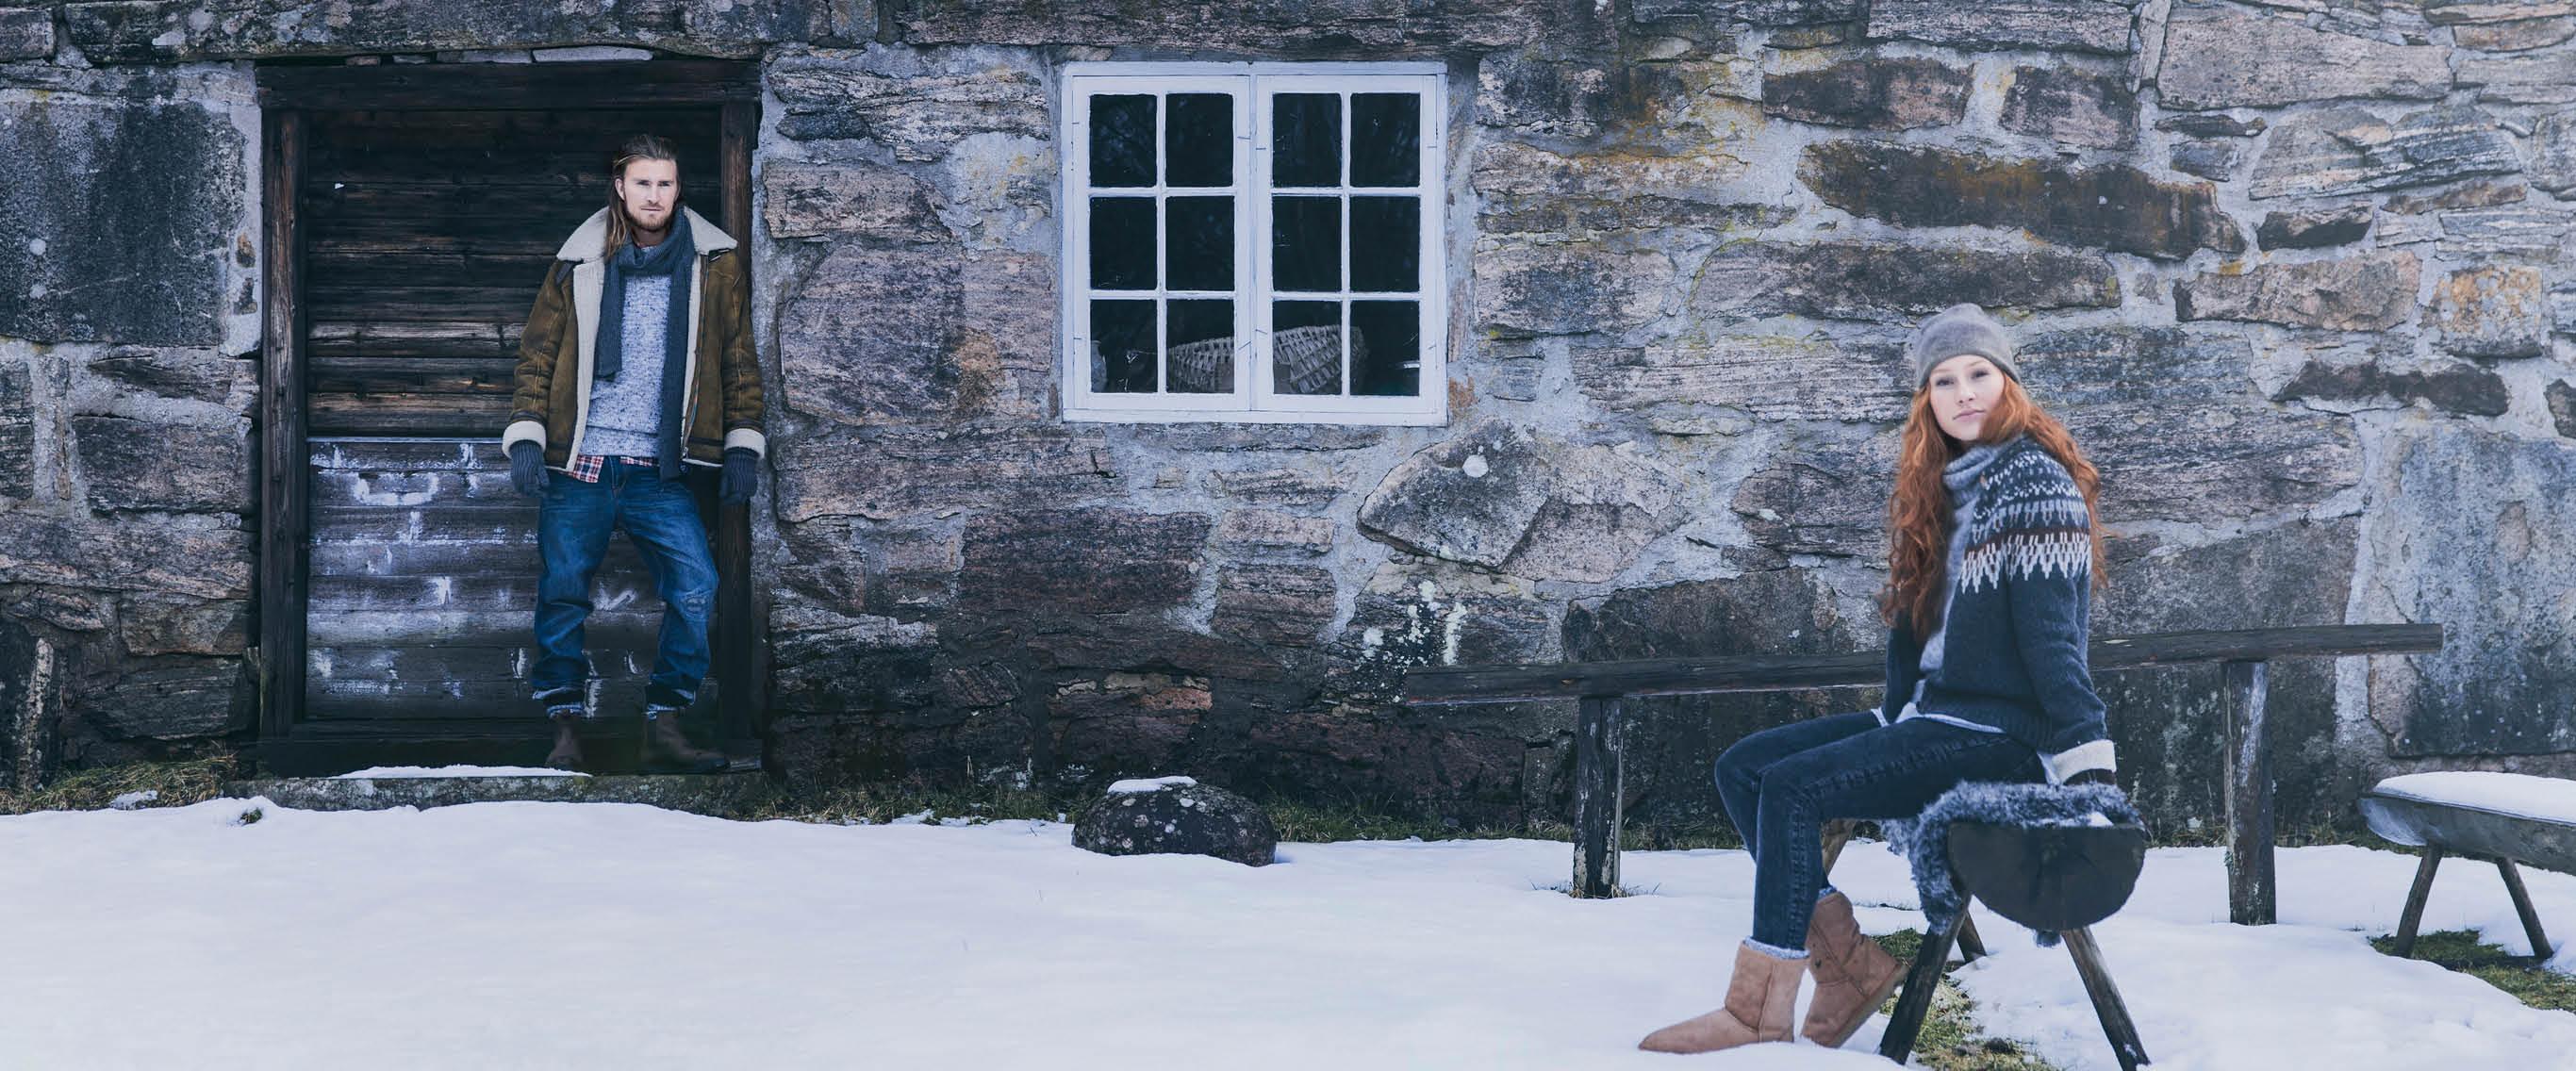 Warm winter shoes with genuin sheepskin